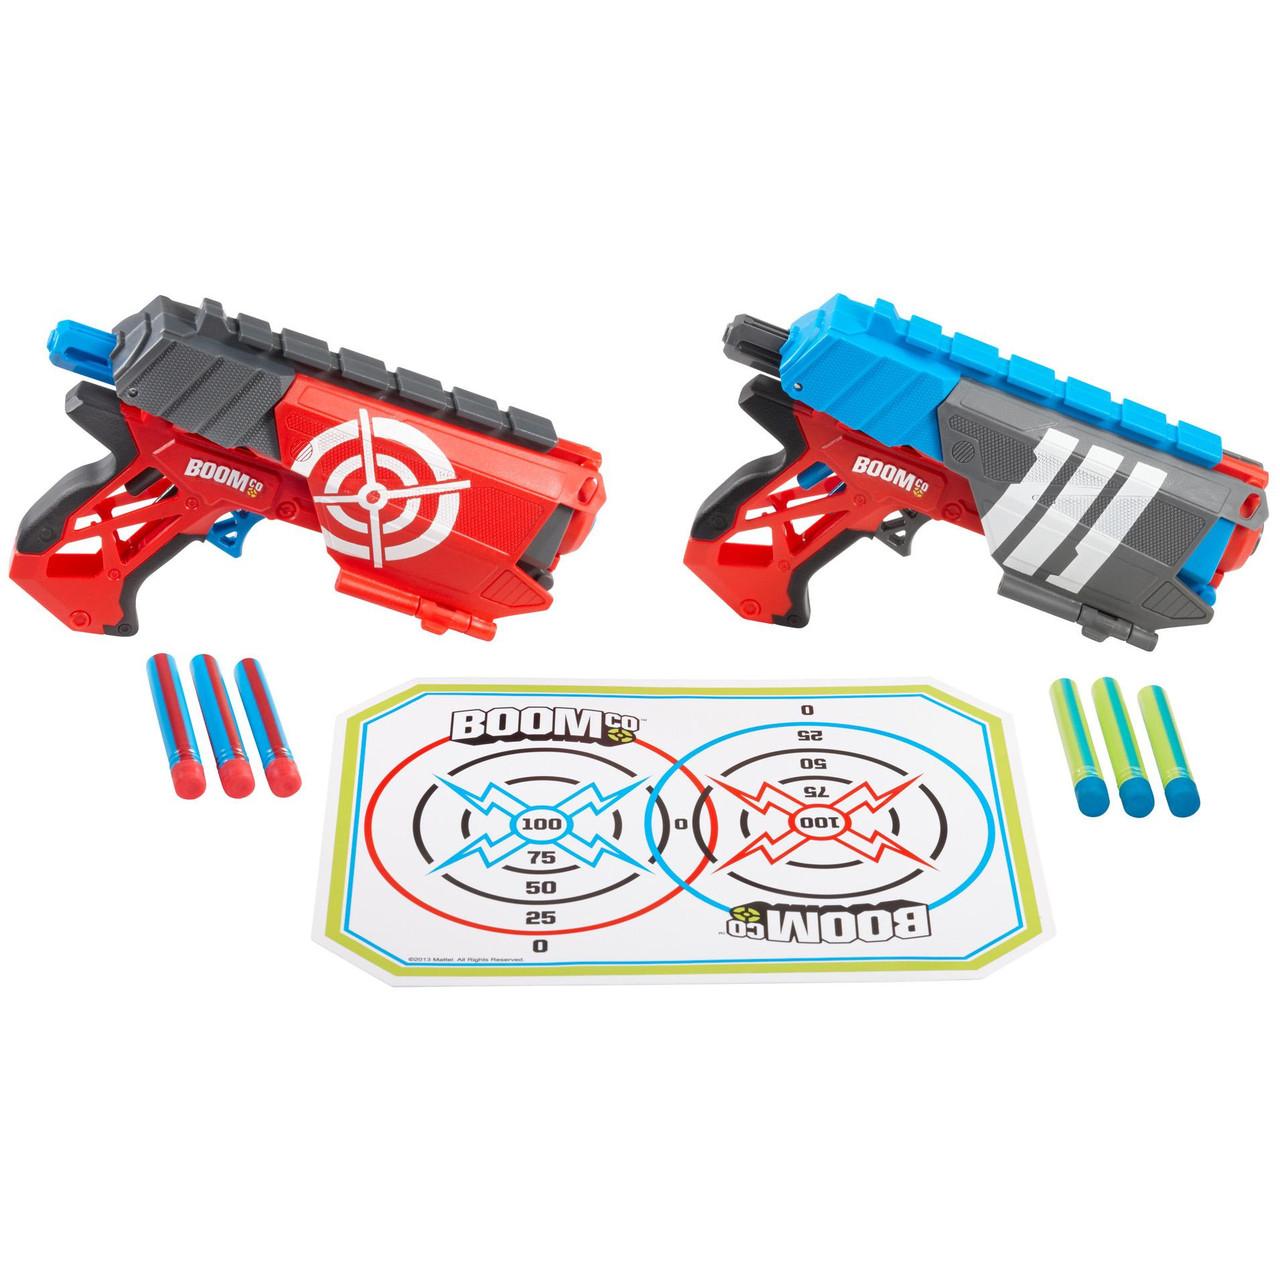 BOOMco Два бластера в комплекте Двойная защита Dual Defenders Blasters